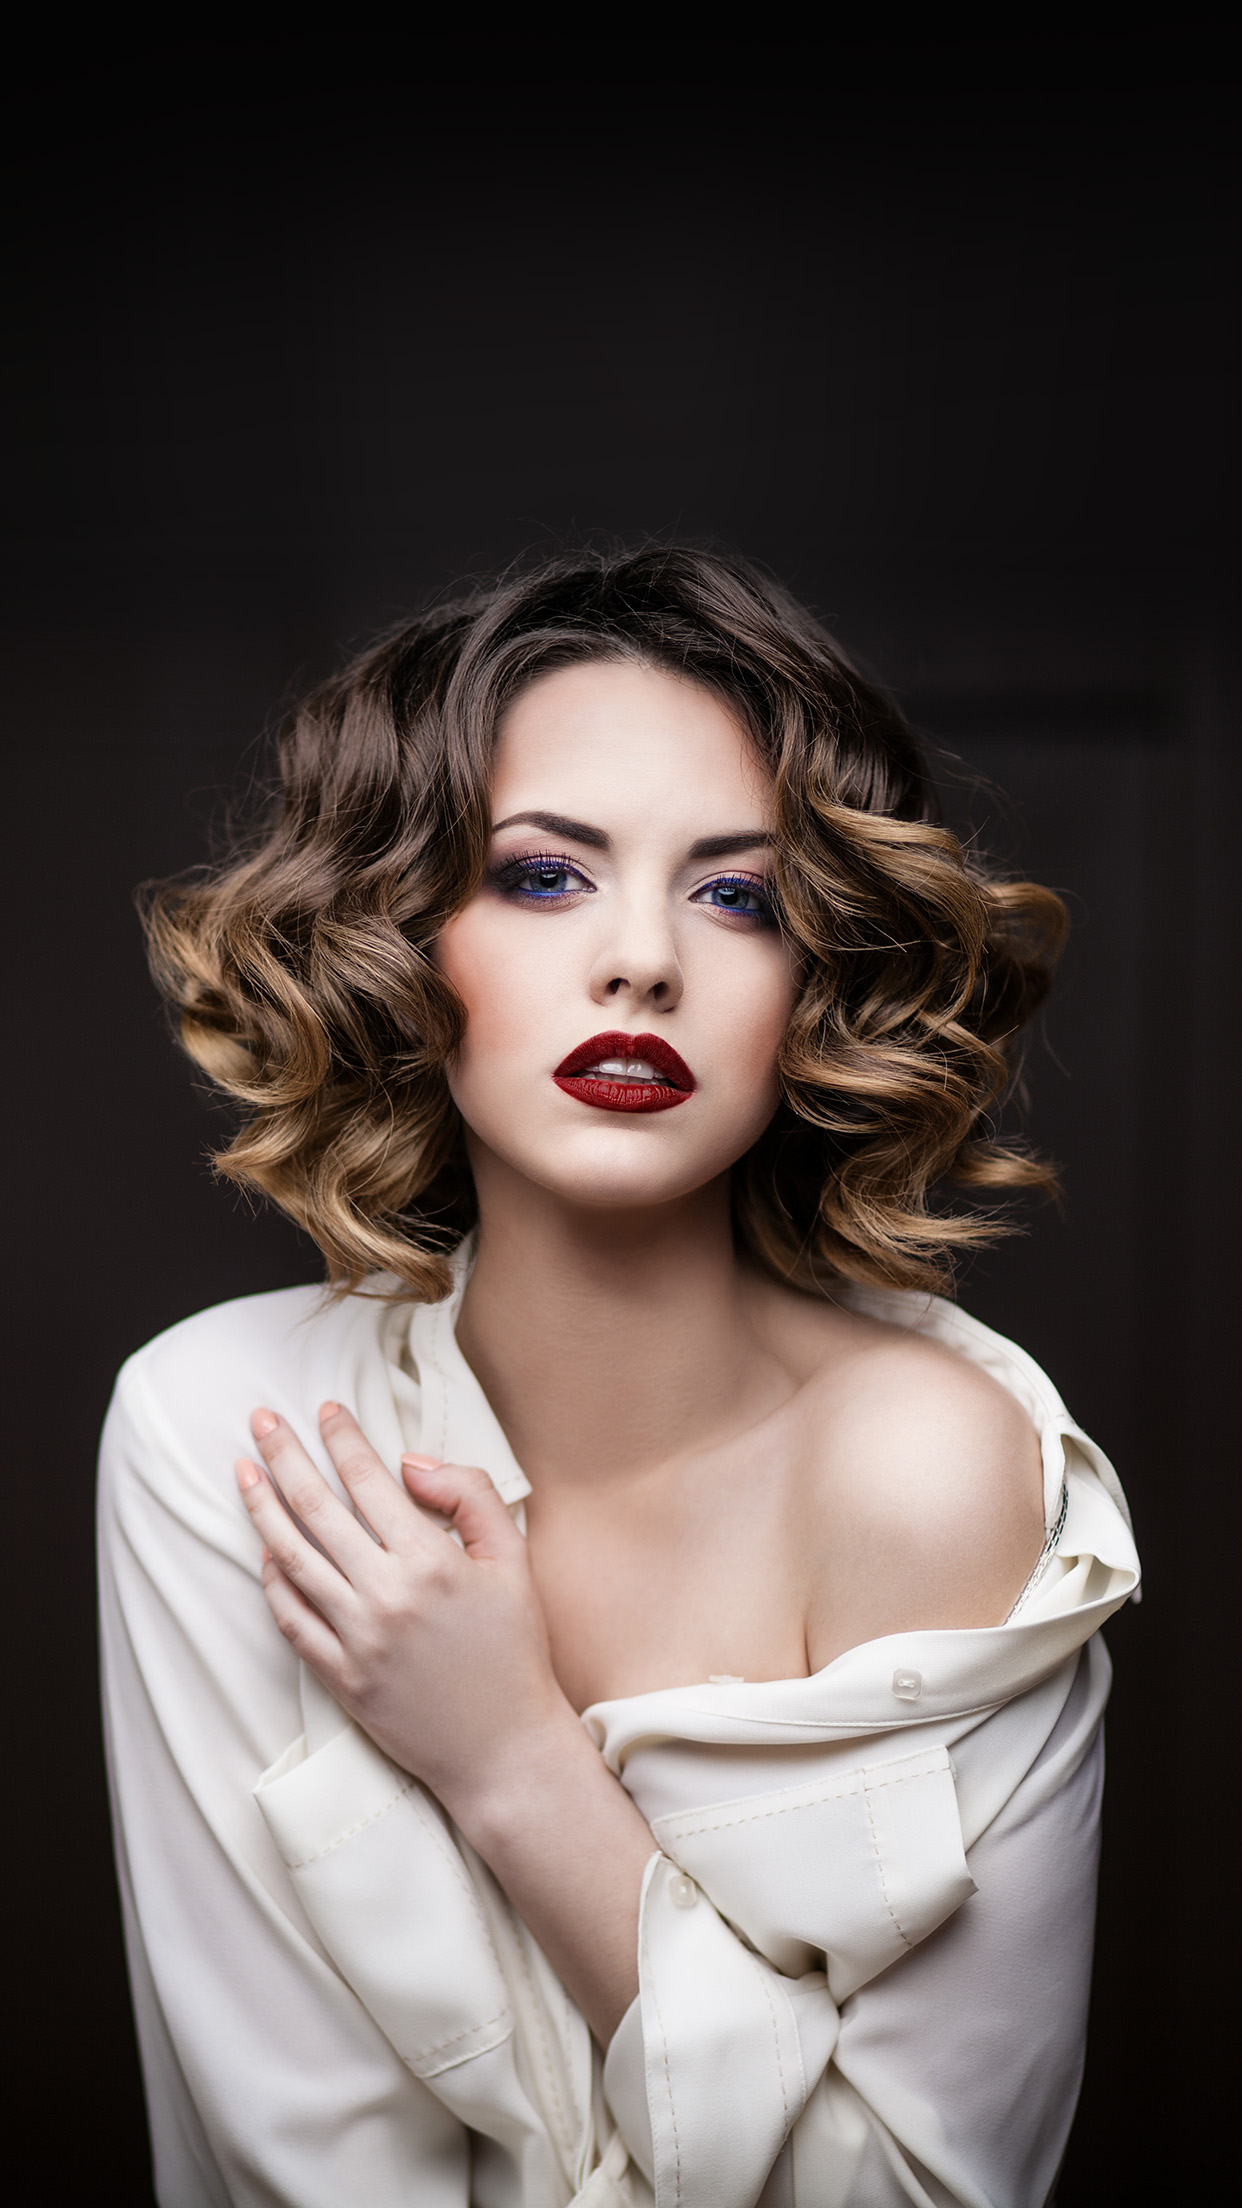 hg25-devushka-model-makiyazh-sexy-girl - Papers.co